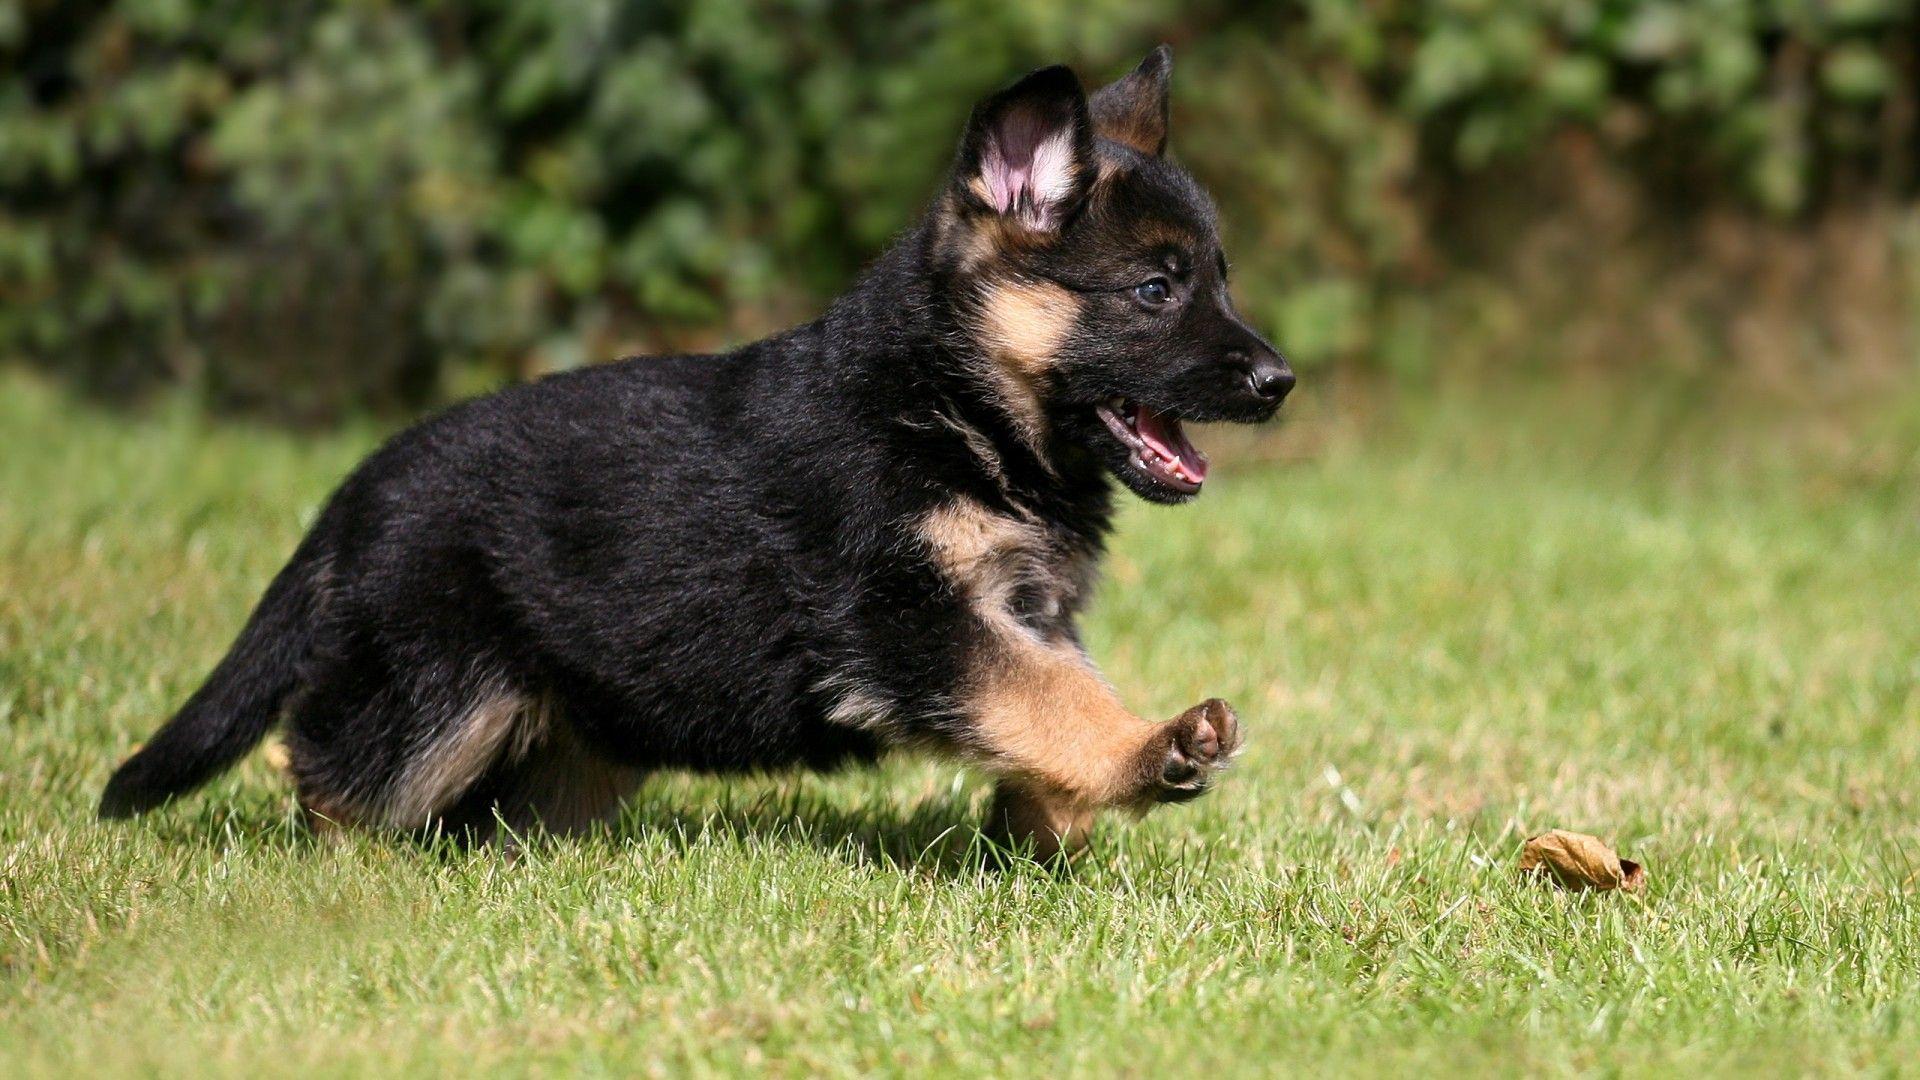 German Shepherd Puppies Wallpapers Top Free German Shepherd Puppies Backgrounds Wallpaperaccess